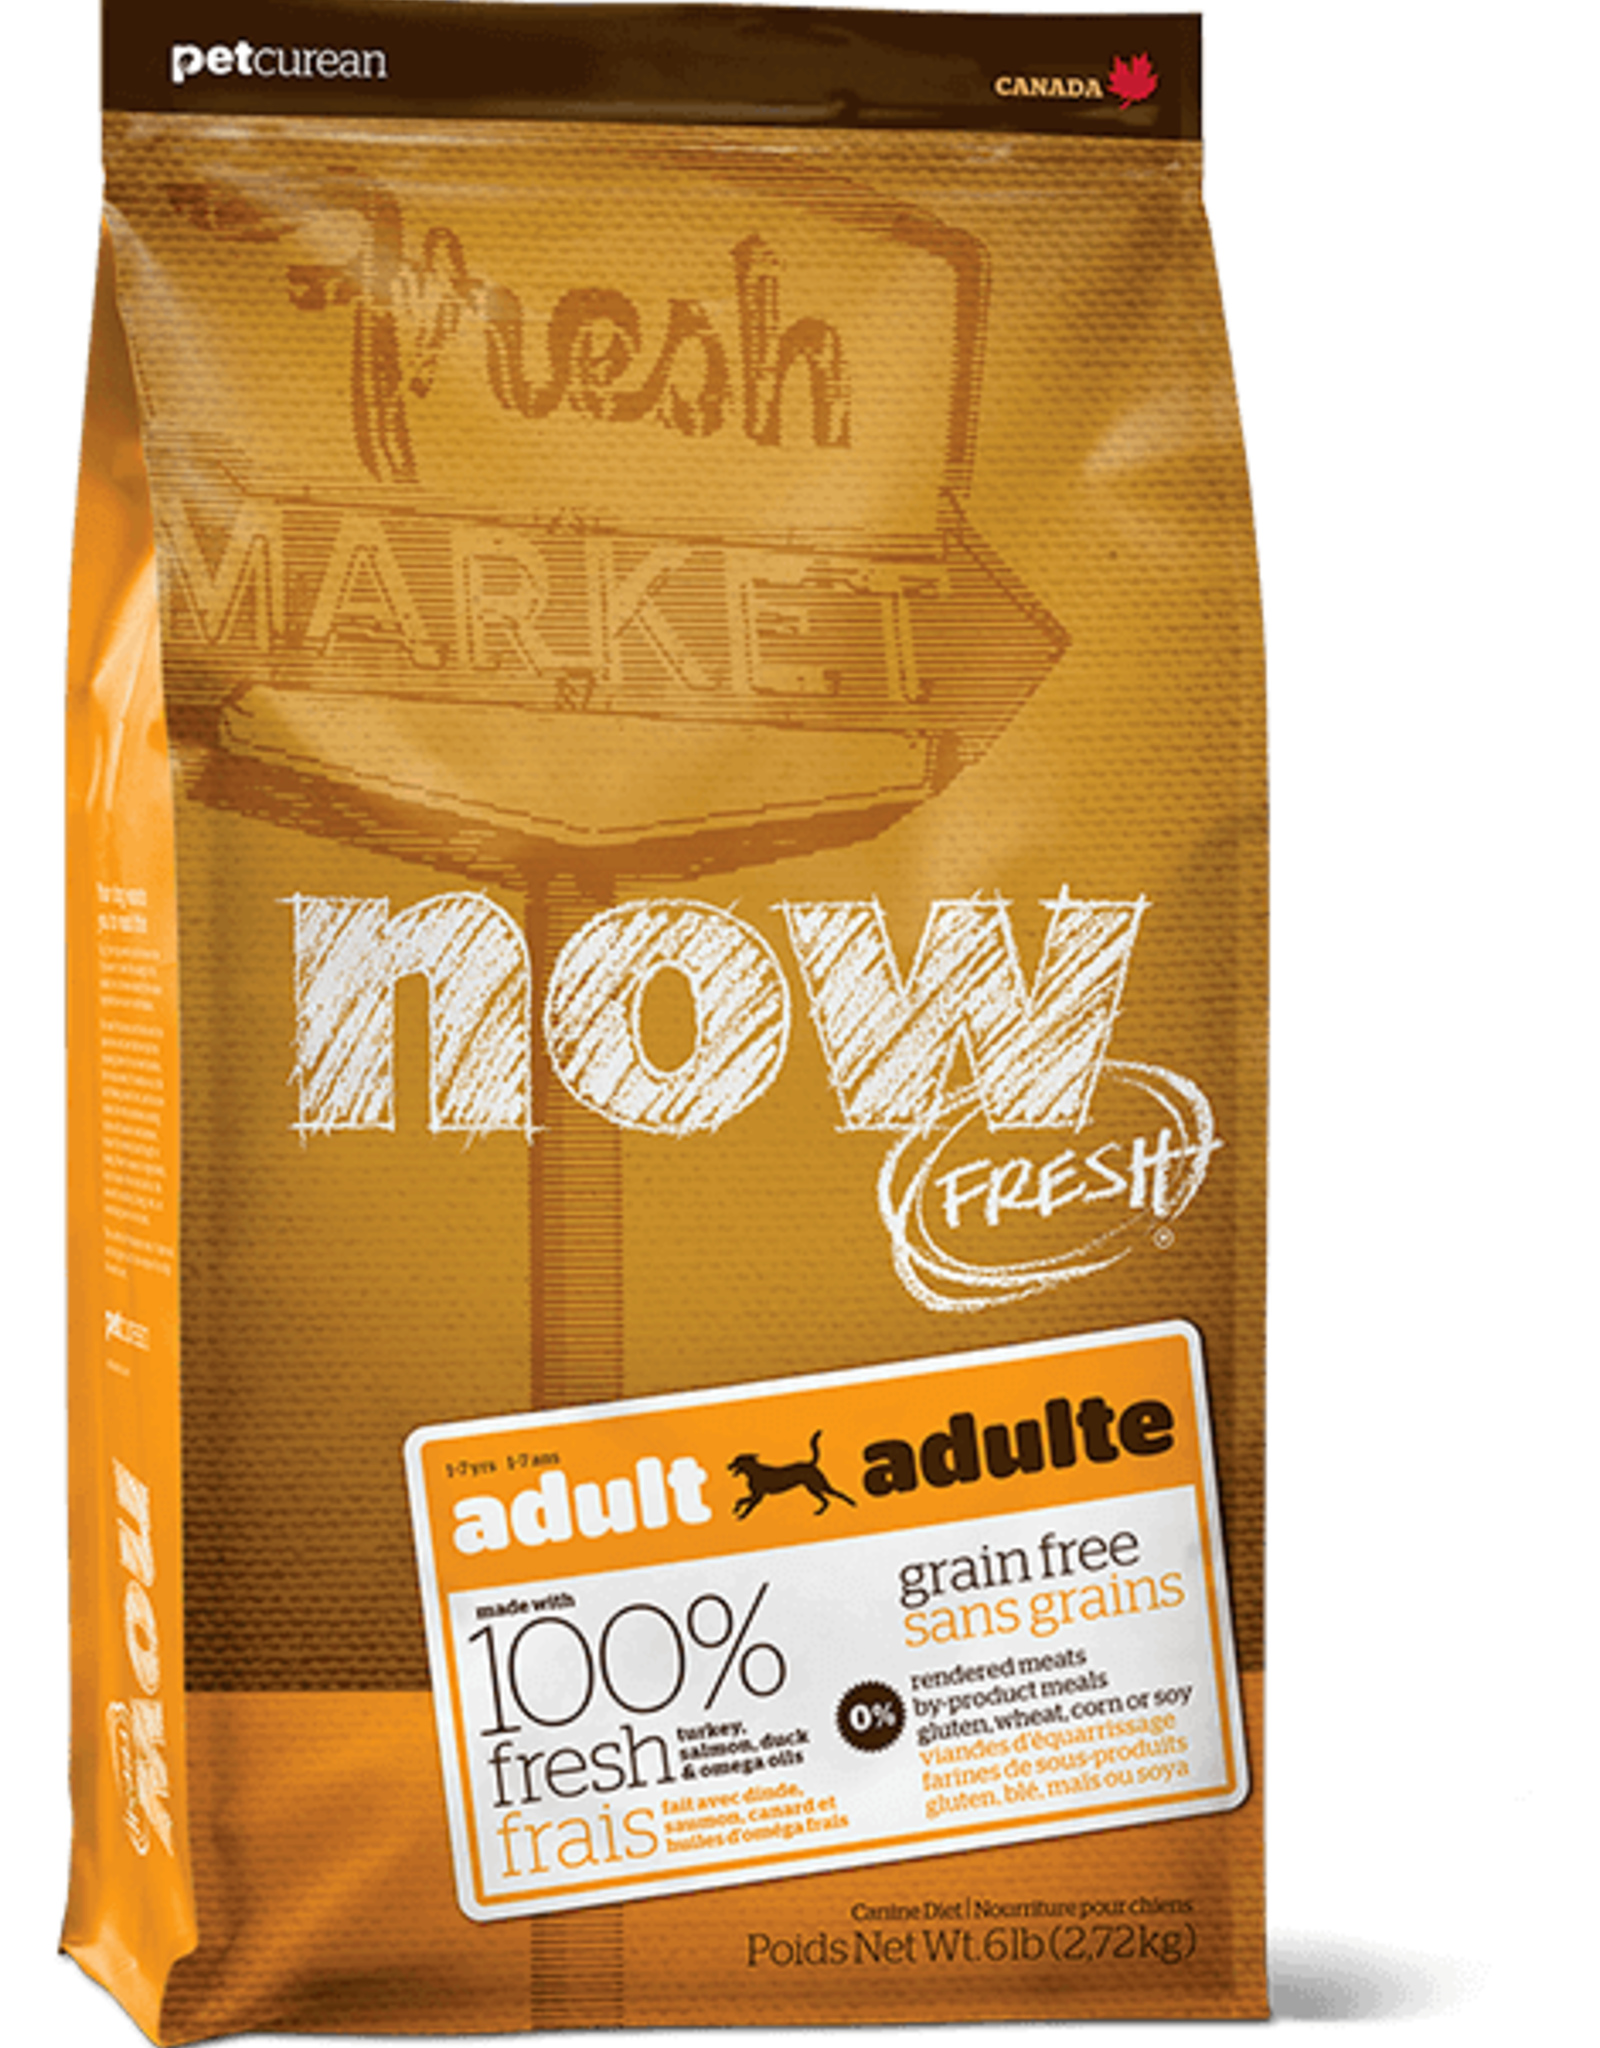 Petcurean Now Fresh Grain Free Dog Adult Turkey Samon Duck 6lb.